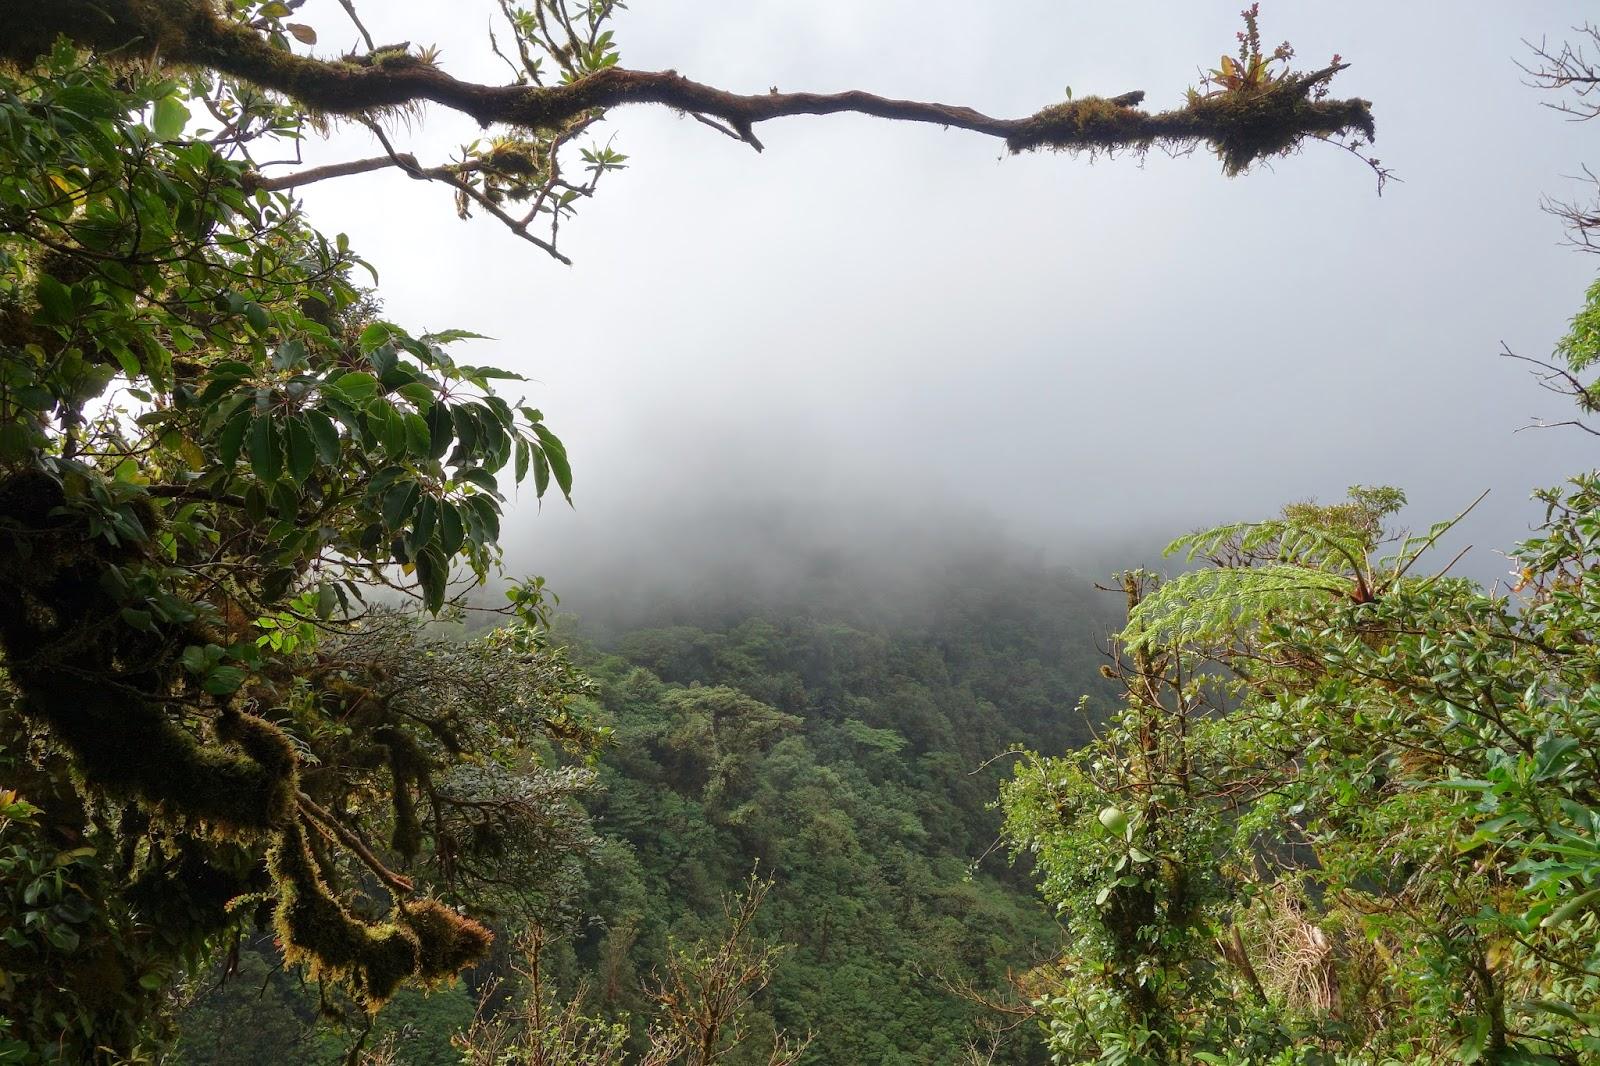 costa rica parc national monteverde quoi faire